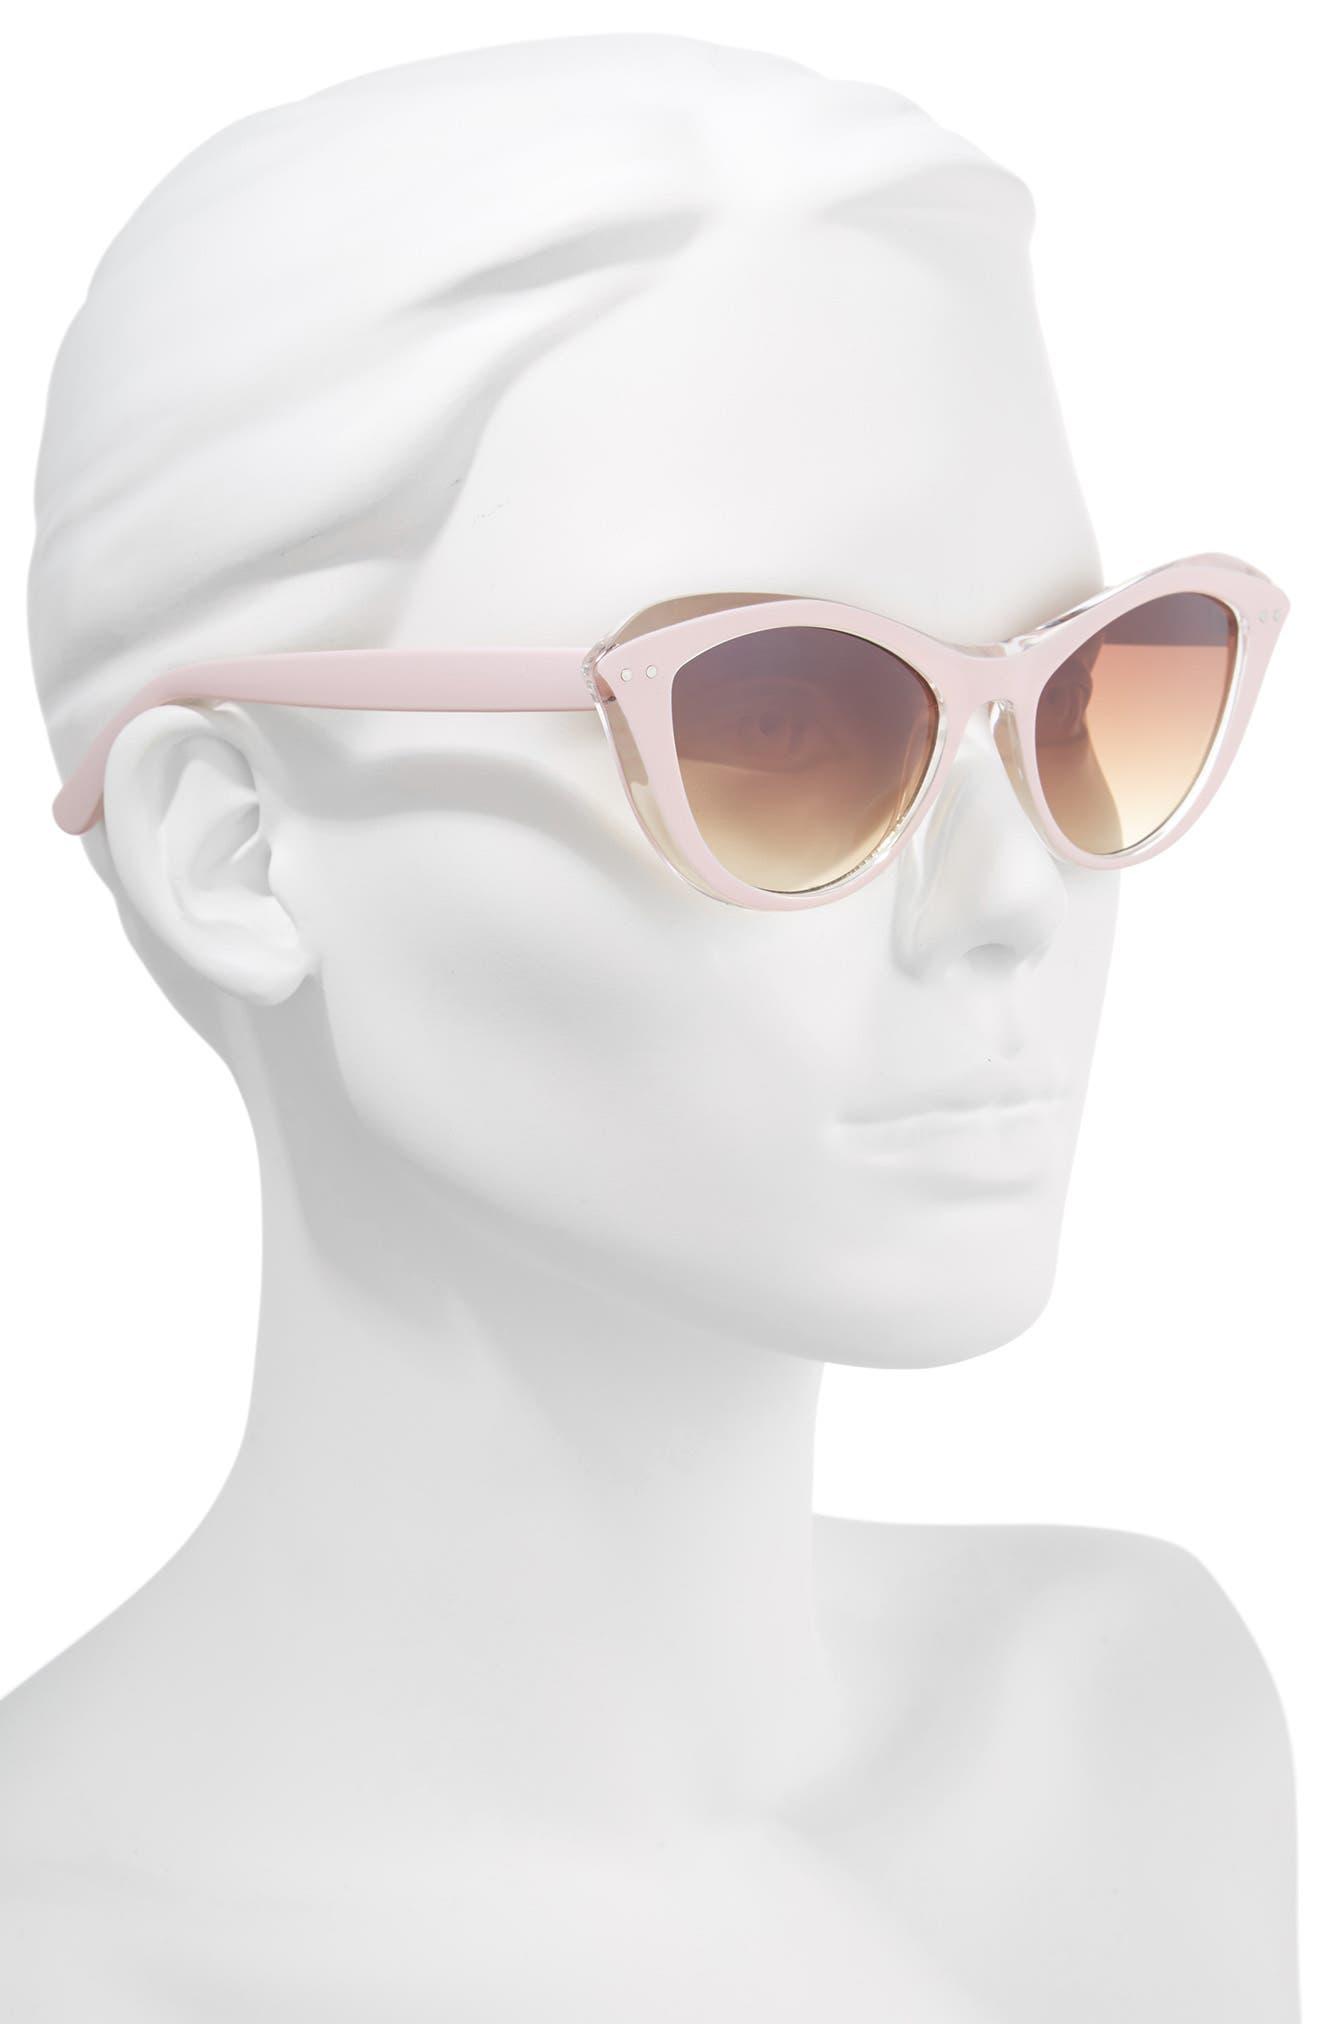 50mm Retro Cat Eye Sunglasses,                             Alternate thumbnail 2, color,                             Pink